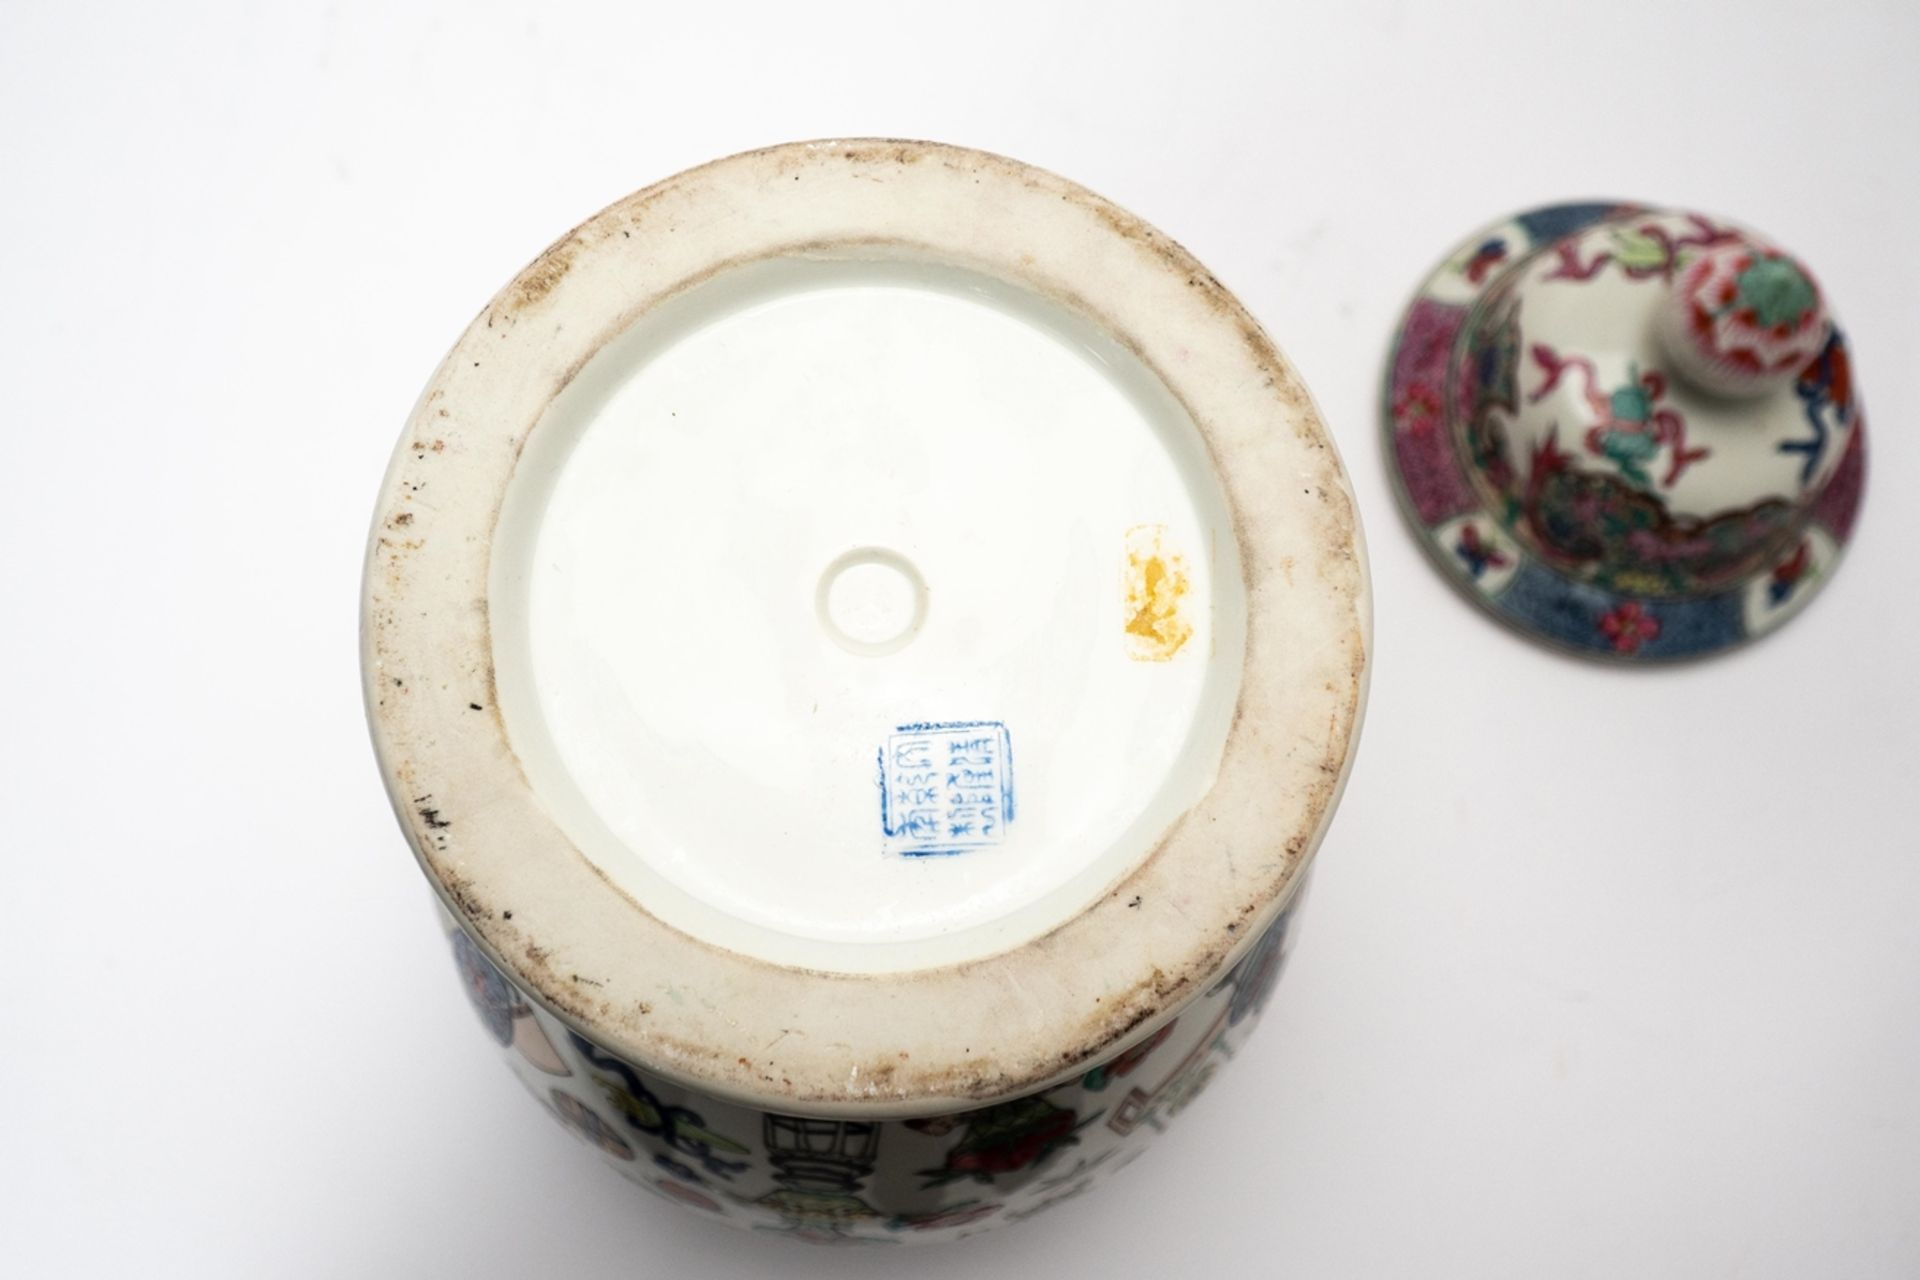 Deckelvase China - Image 5 of 5